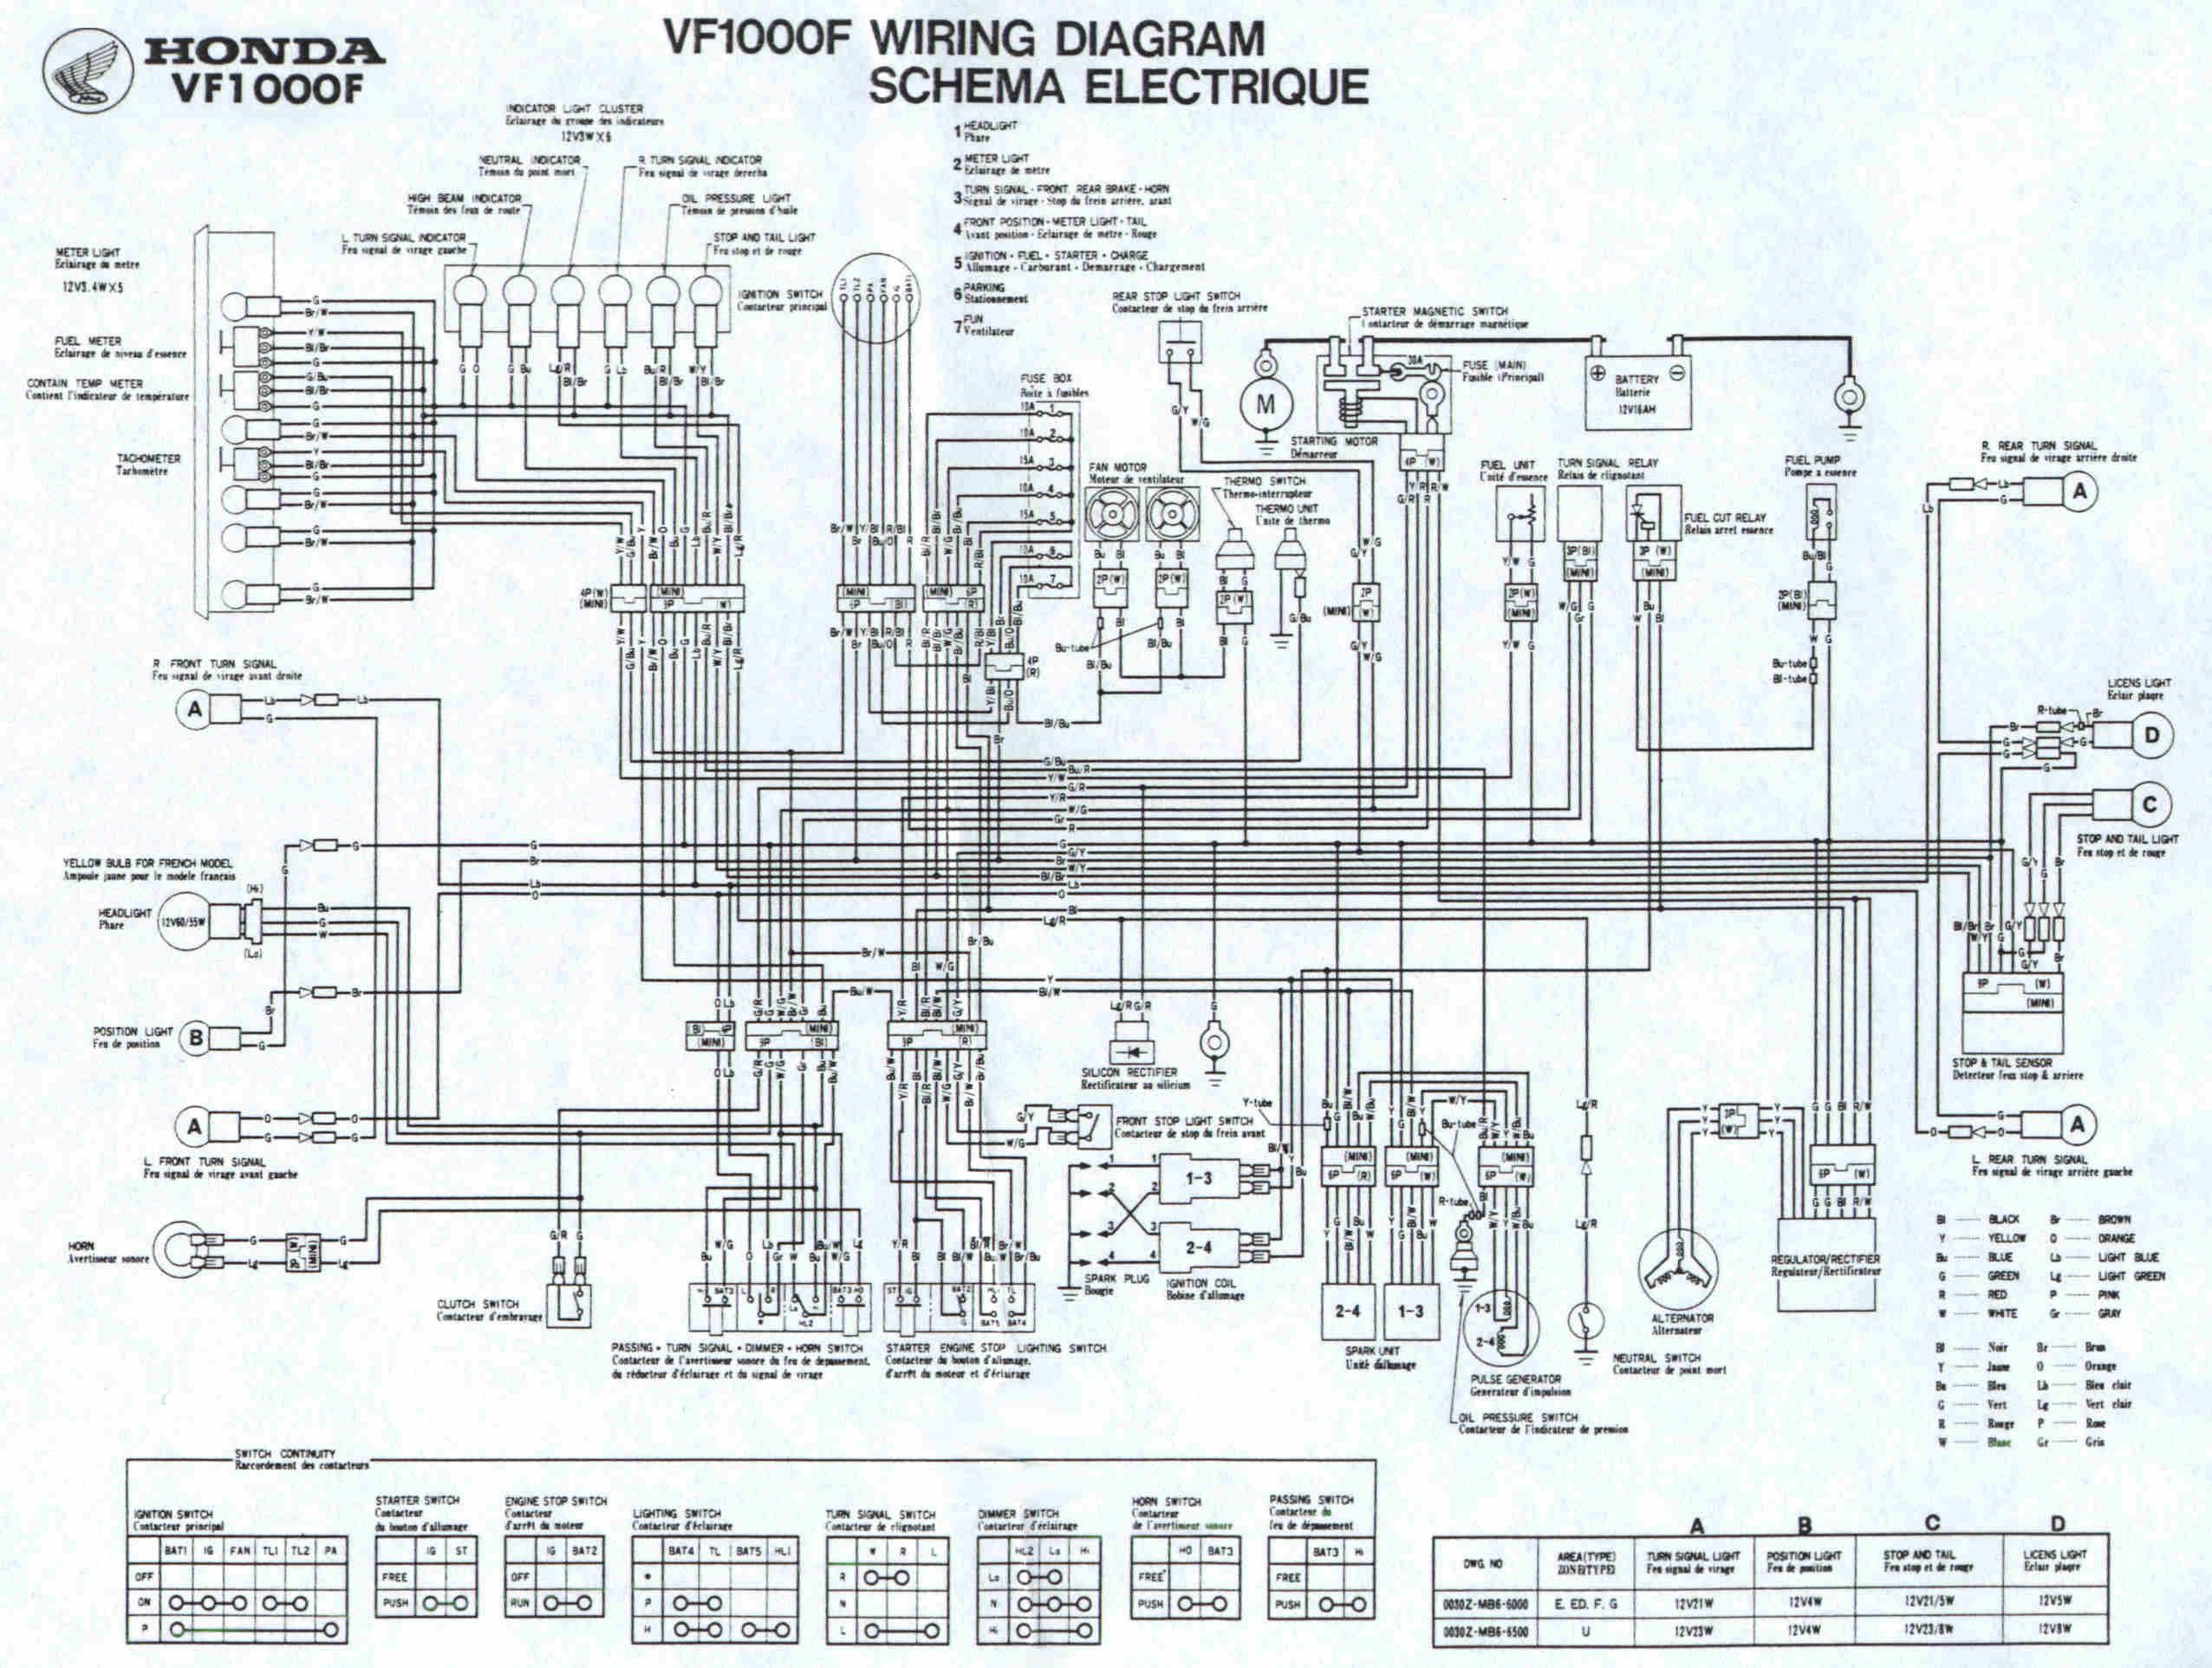 XH_2409] Suzuki Katana Wiring Diagram On Wiring Diagram 2006 Honda Shadow  1100 Download DiagramOrsal Push Abole Xaem Numdin Kook Benol Reda Emba Mohammedshrine Librar  Wiring 101